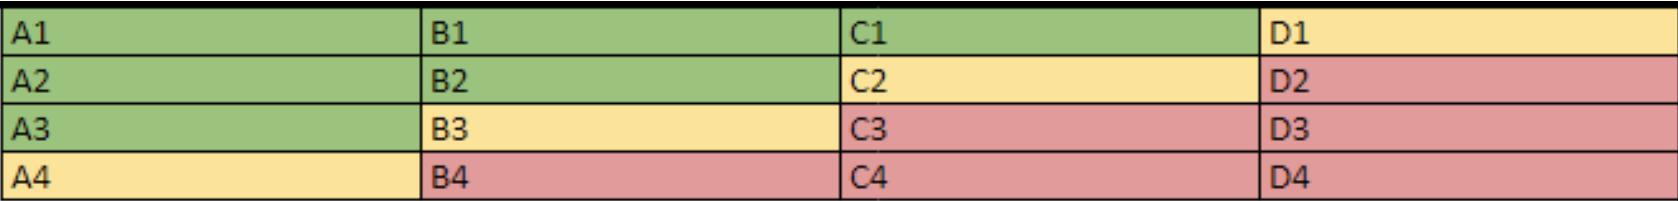 abm lead grading 3